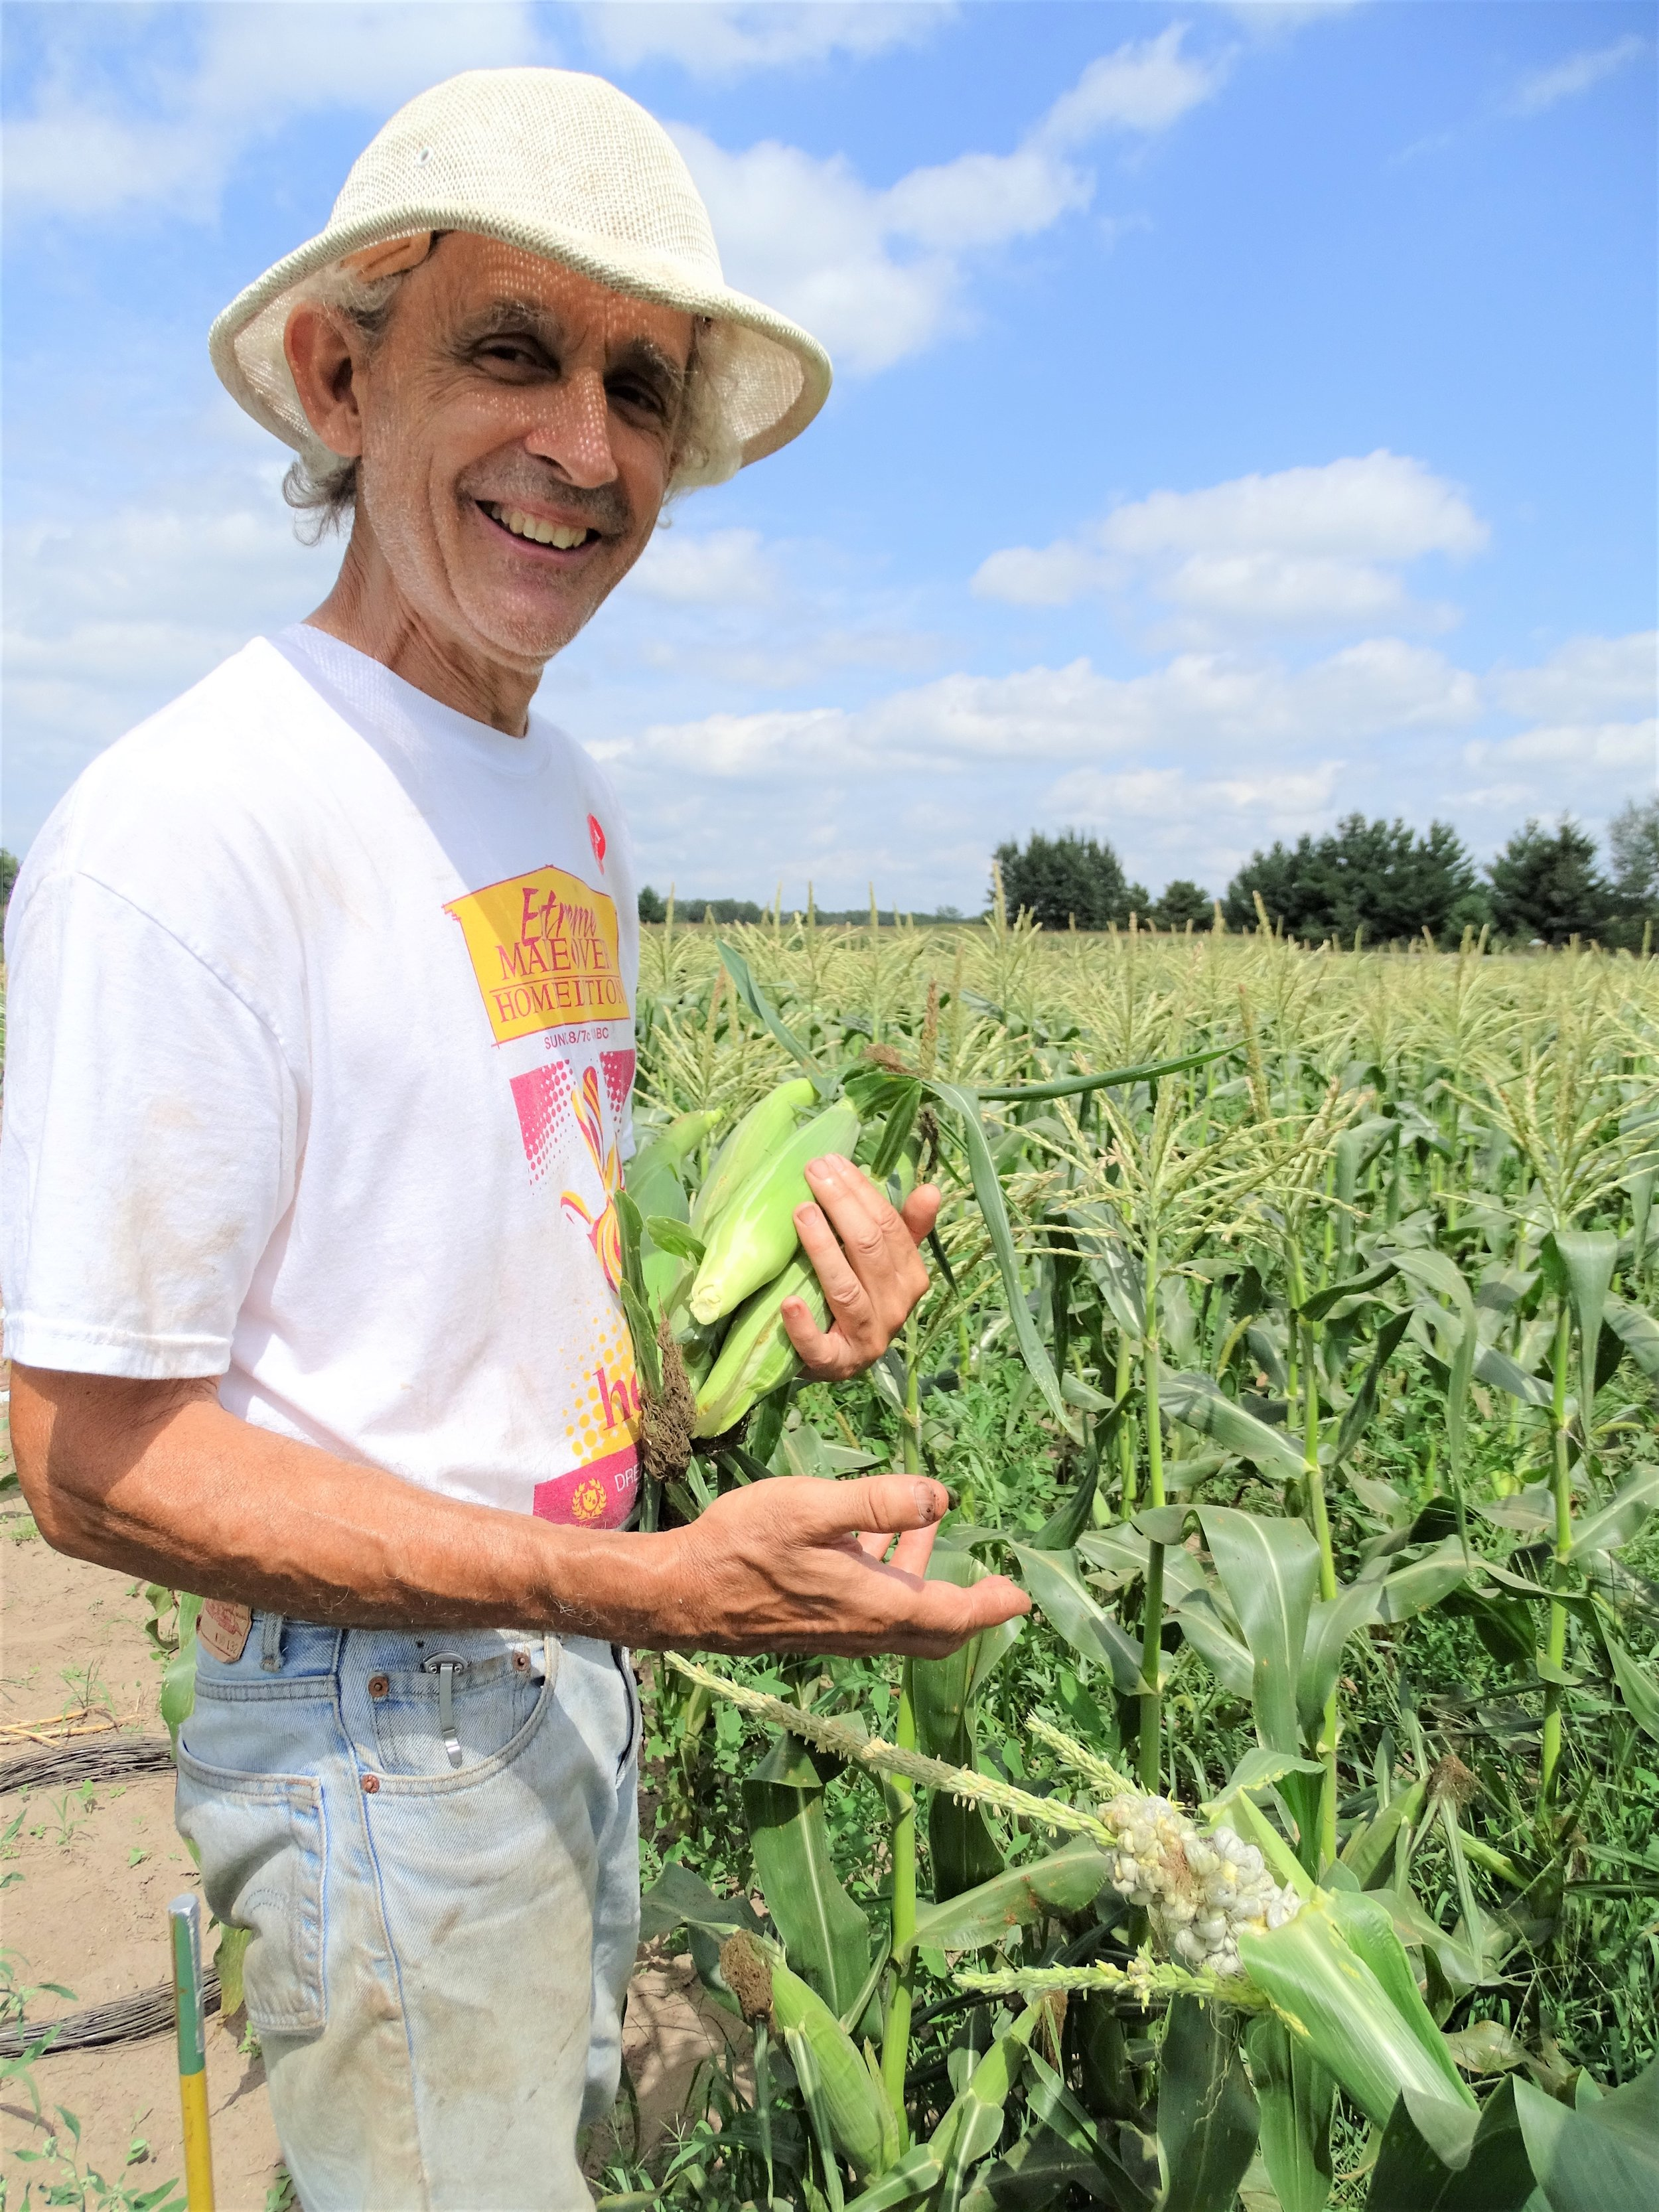 Farmer John in his field of dreams. Photo by  HeidiK Images .